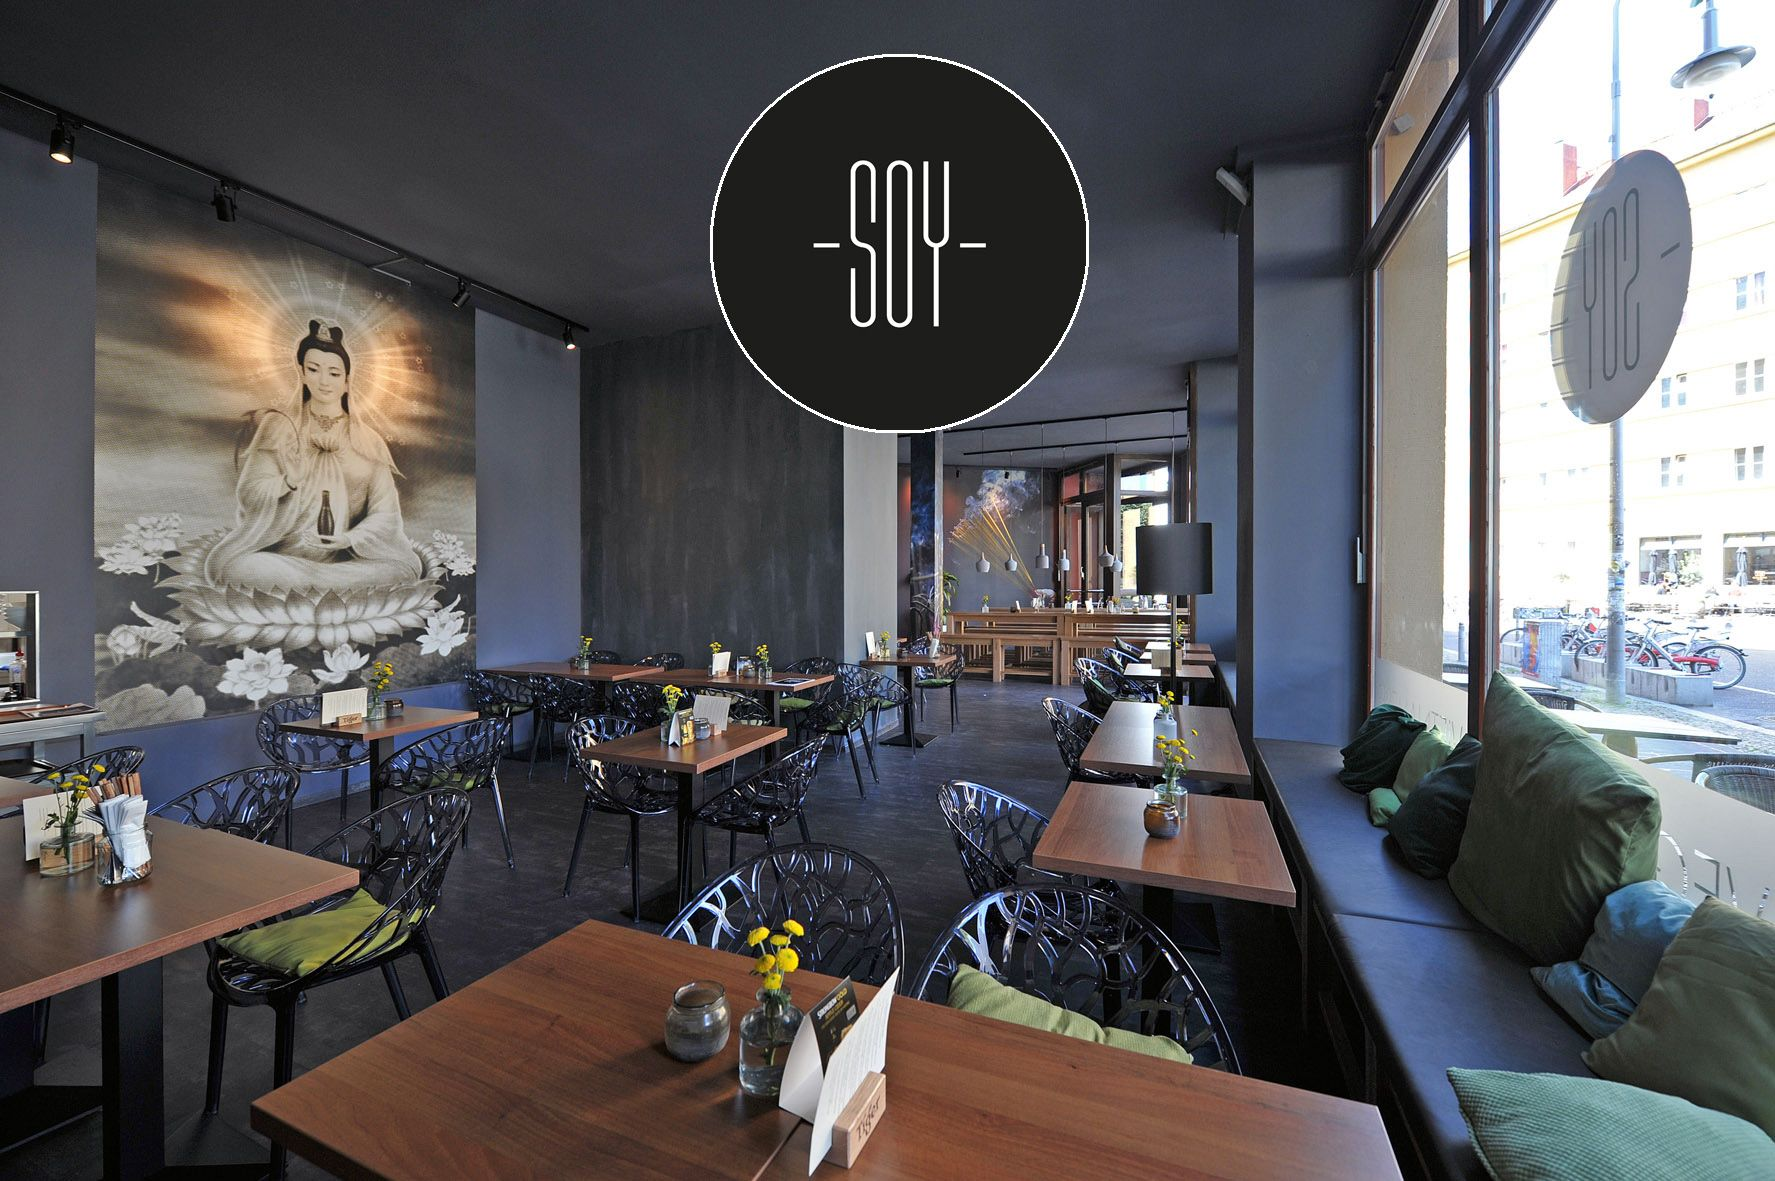 vegan vietnamese restaurant / Rosa-Luxemburg-Strasse 30, Berlin ...